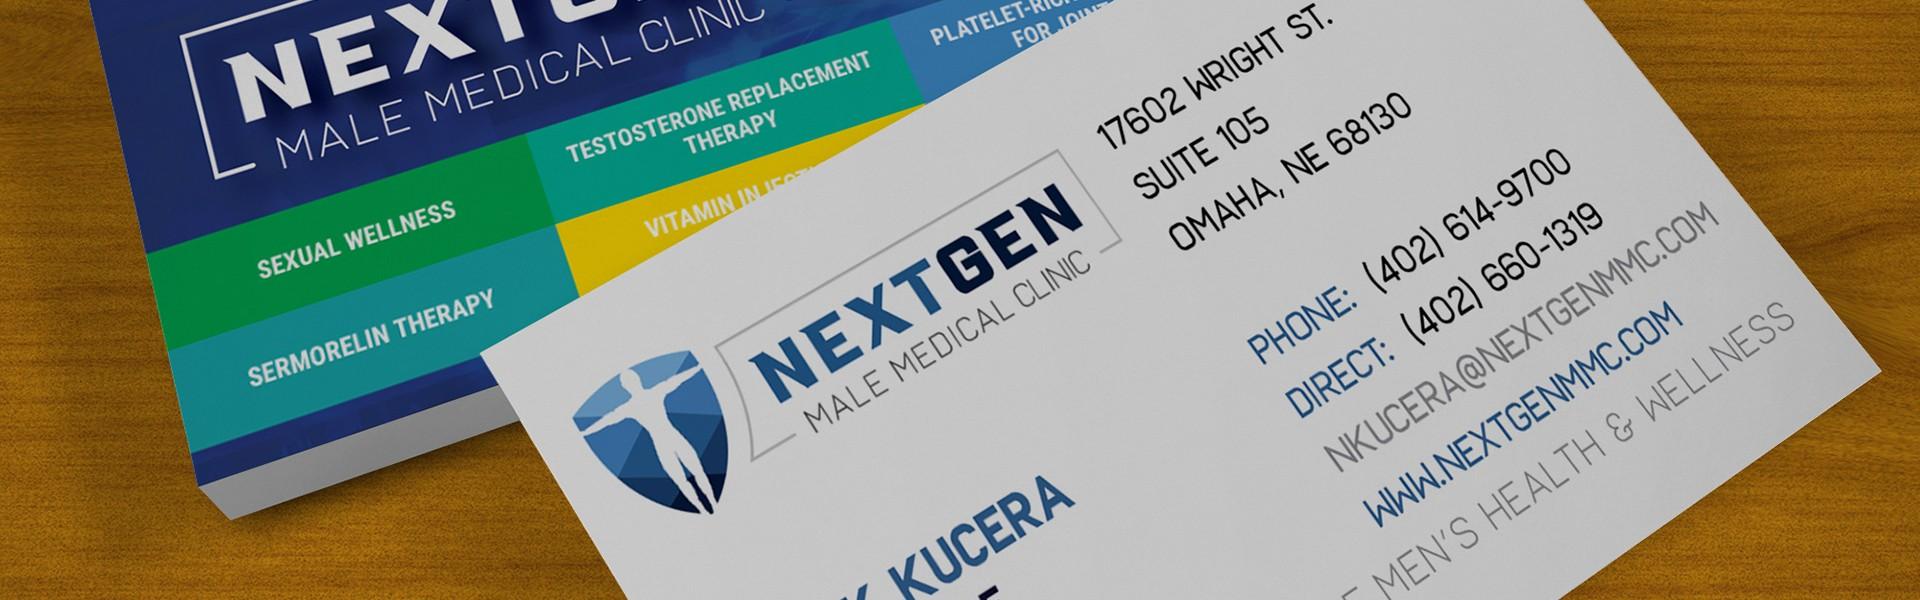 NextGen Male Medical Clinic